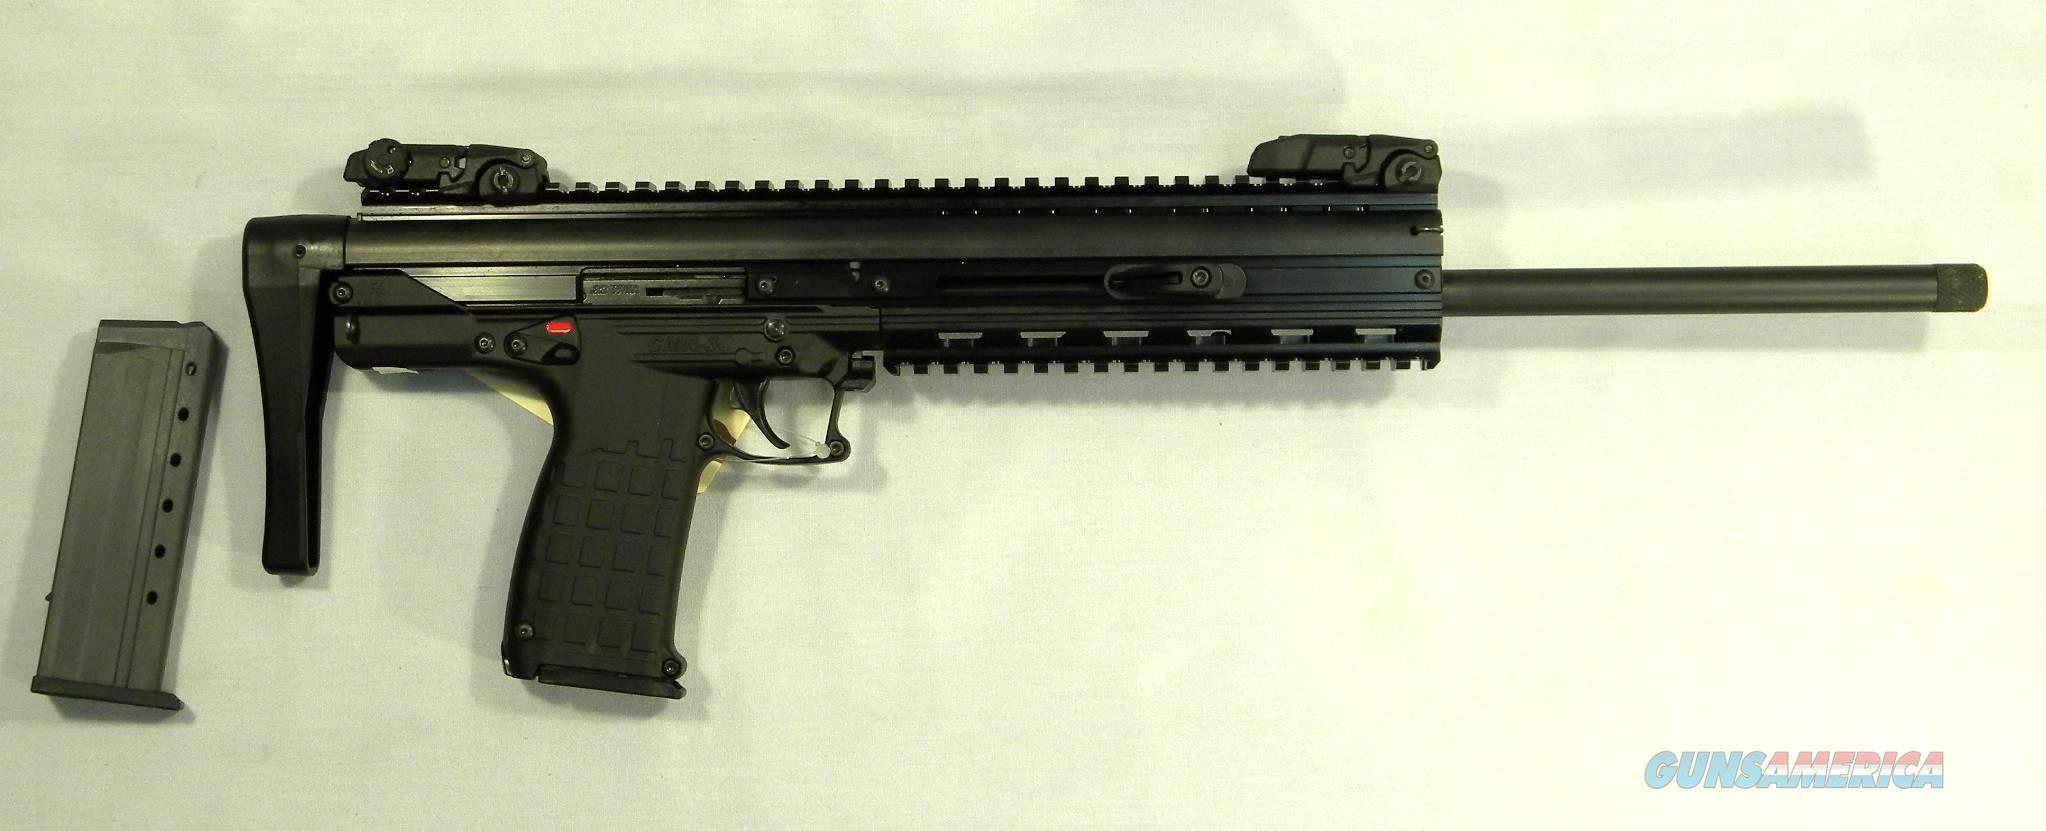 Kel-Tec CMR-30, .22 WMR Semi-Automatic Rifle, Collapsing Stock, NIB With Two 30-Rd Mags!  Guns > Rifles > Kel-Tec Rifles